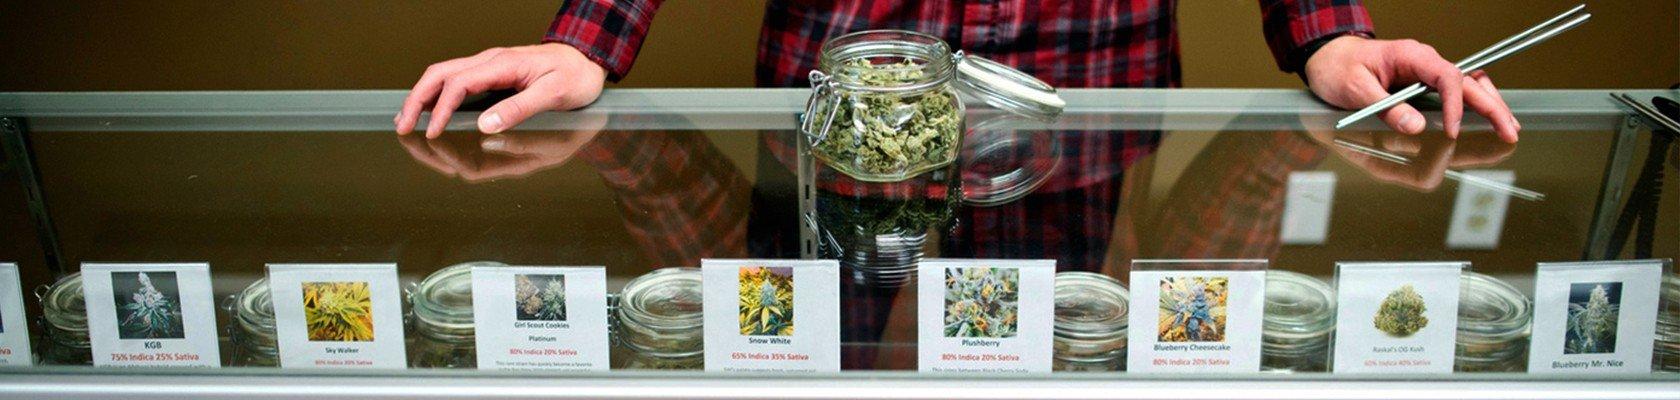 Best Sellers   Best Weed Indica, Sativa, Hybrid Strains & Edibles